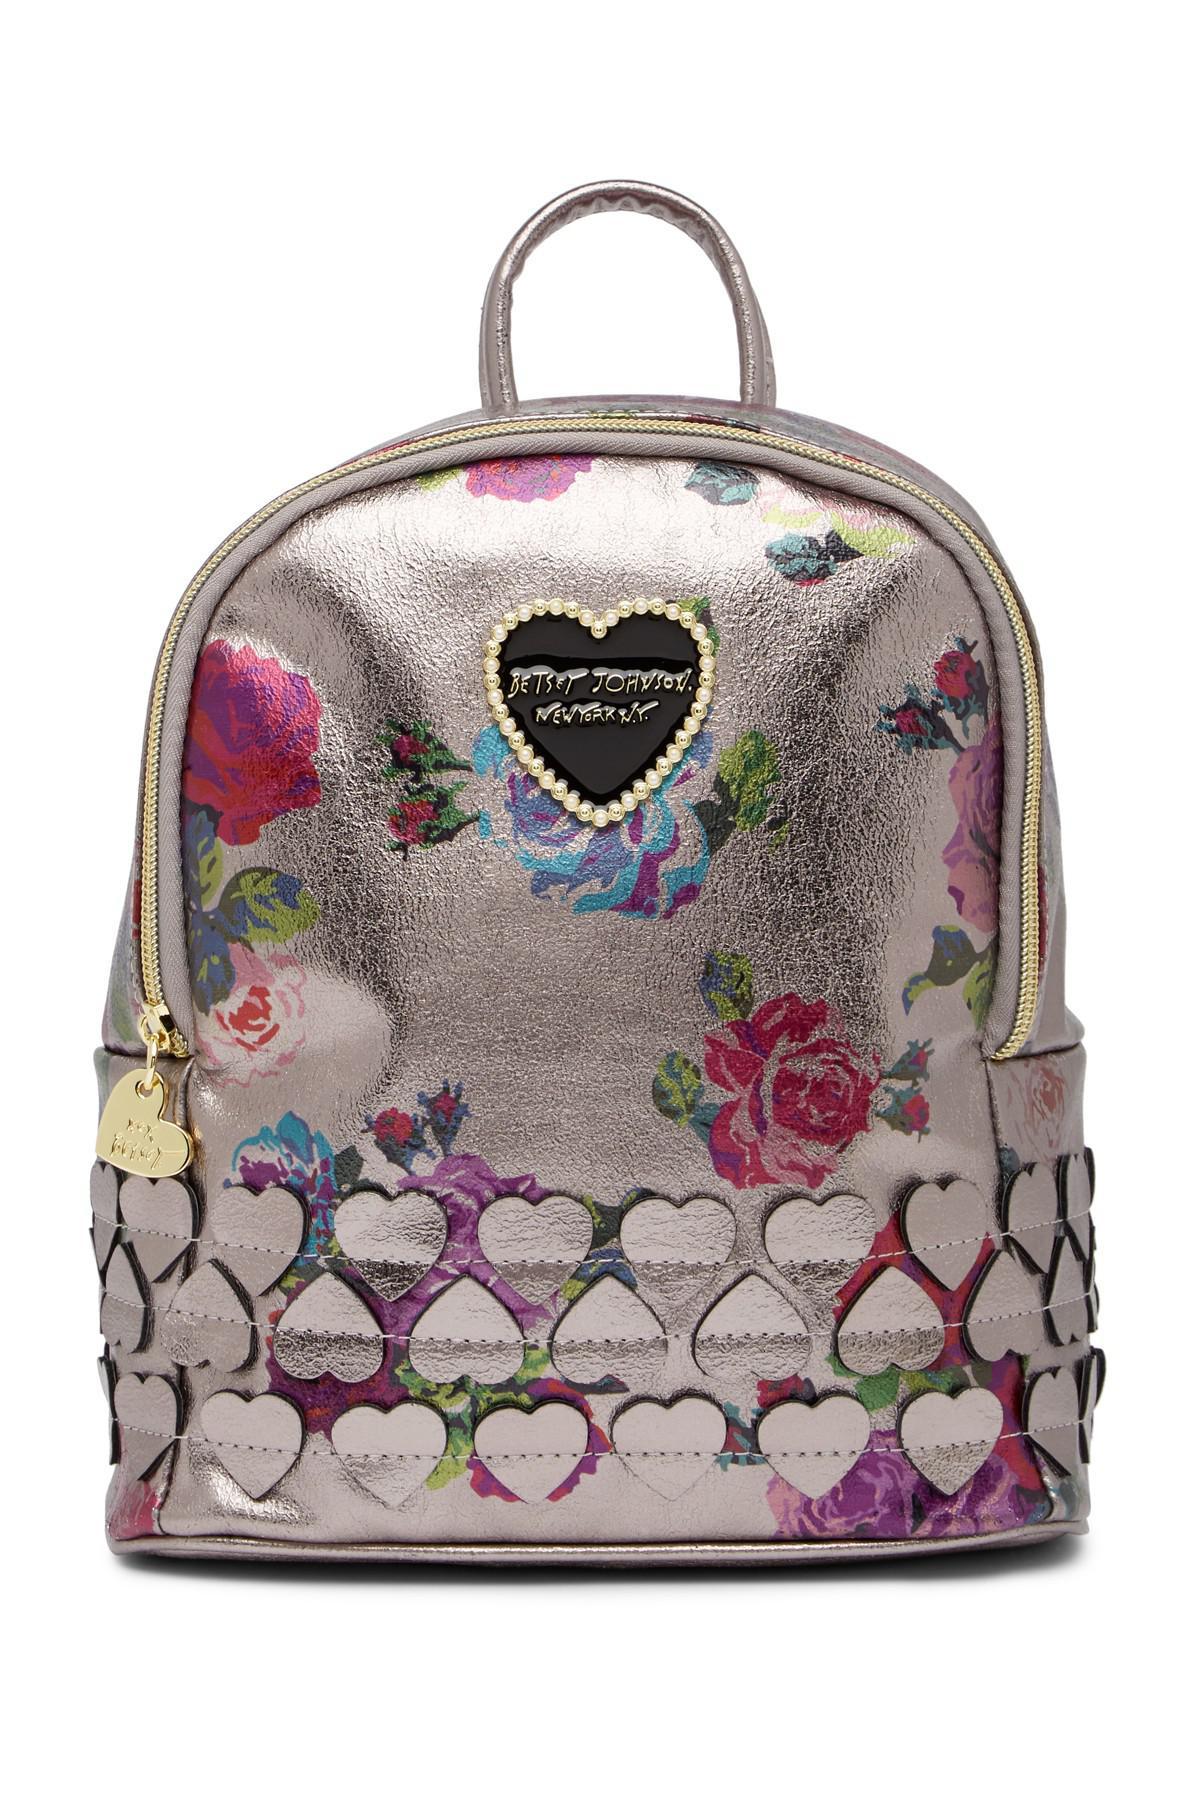 Lyst - Betsey Johnson Heart Applique Mini Backpack in Metallic